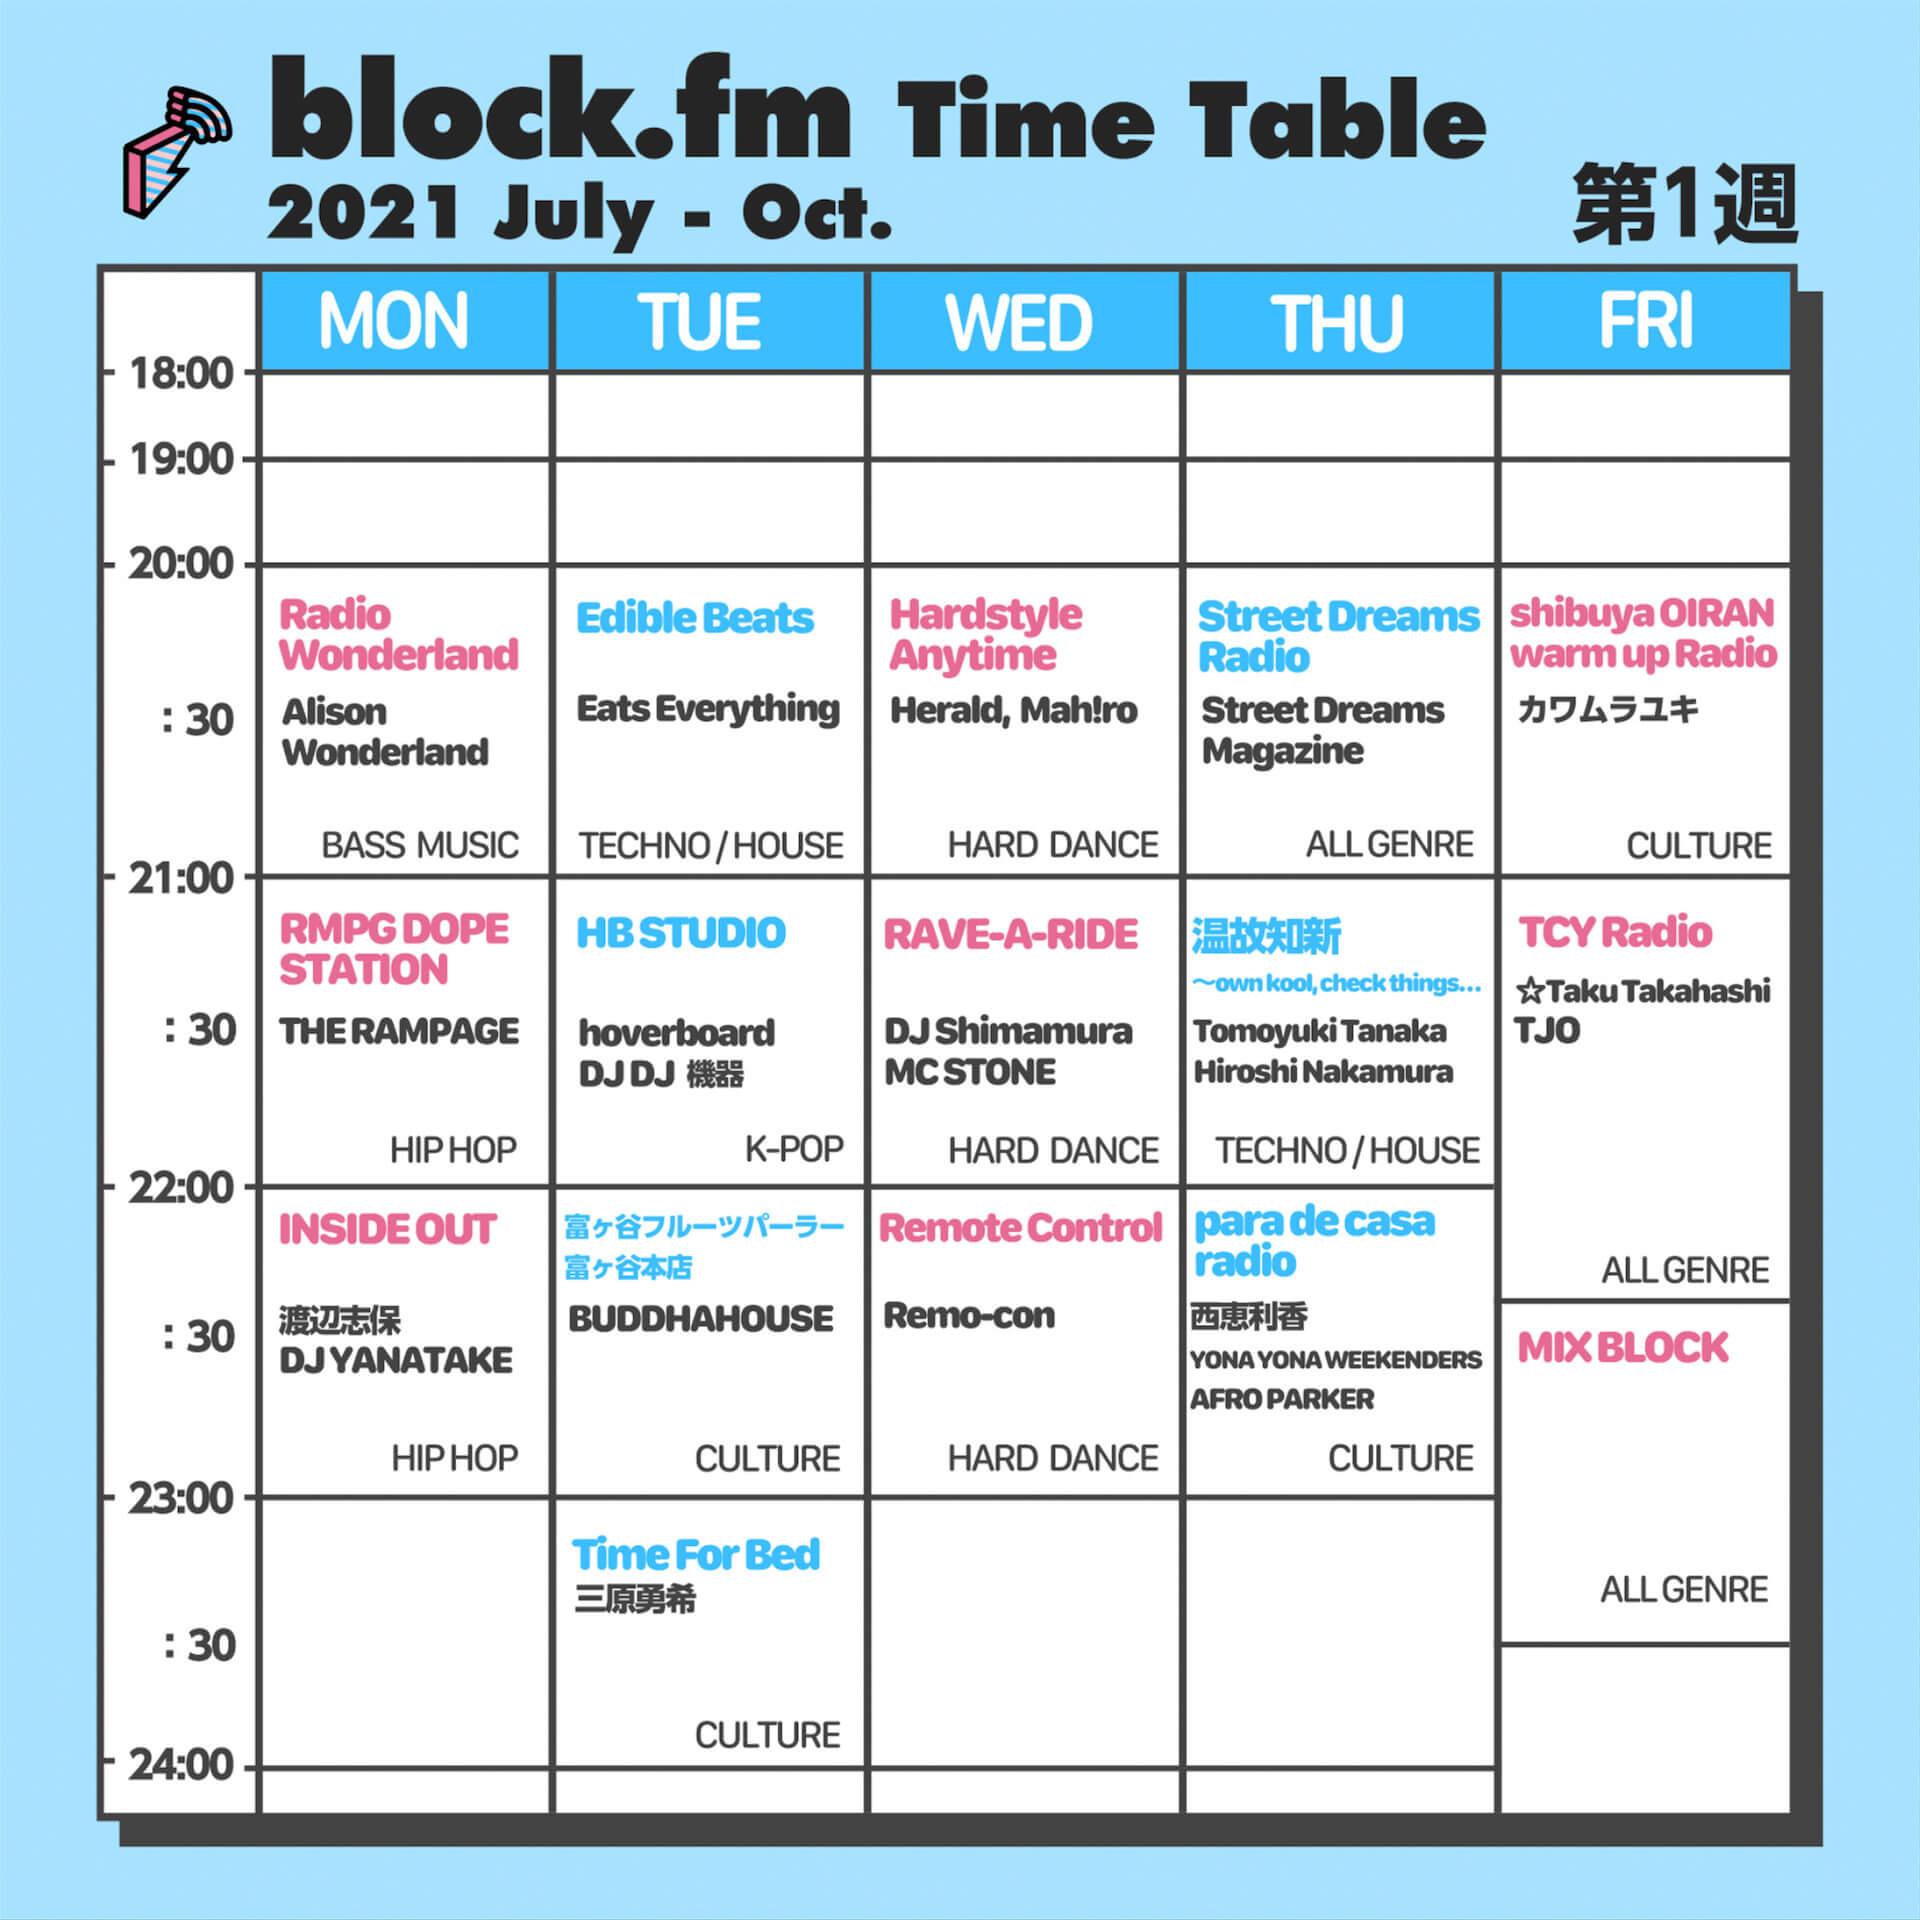 block.fmにて三原勇希のレギュラー番組『Time for Bed』が゙放送スタート!7月以降のラジオ放送スケジュールも公開 music_210702_Time-for-Bed5